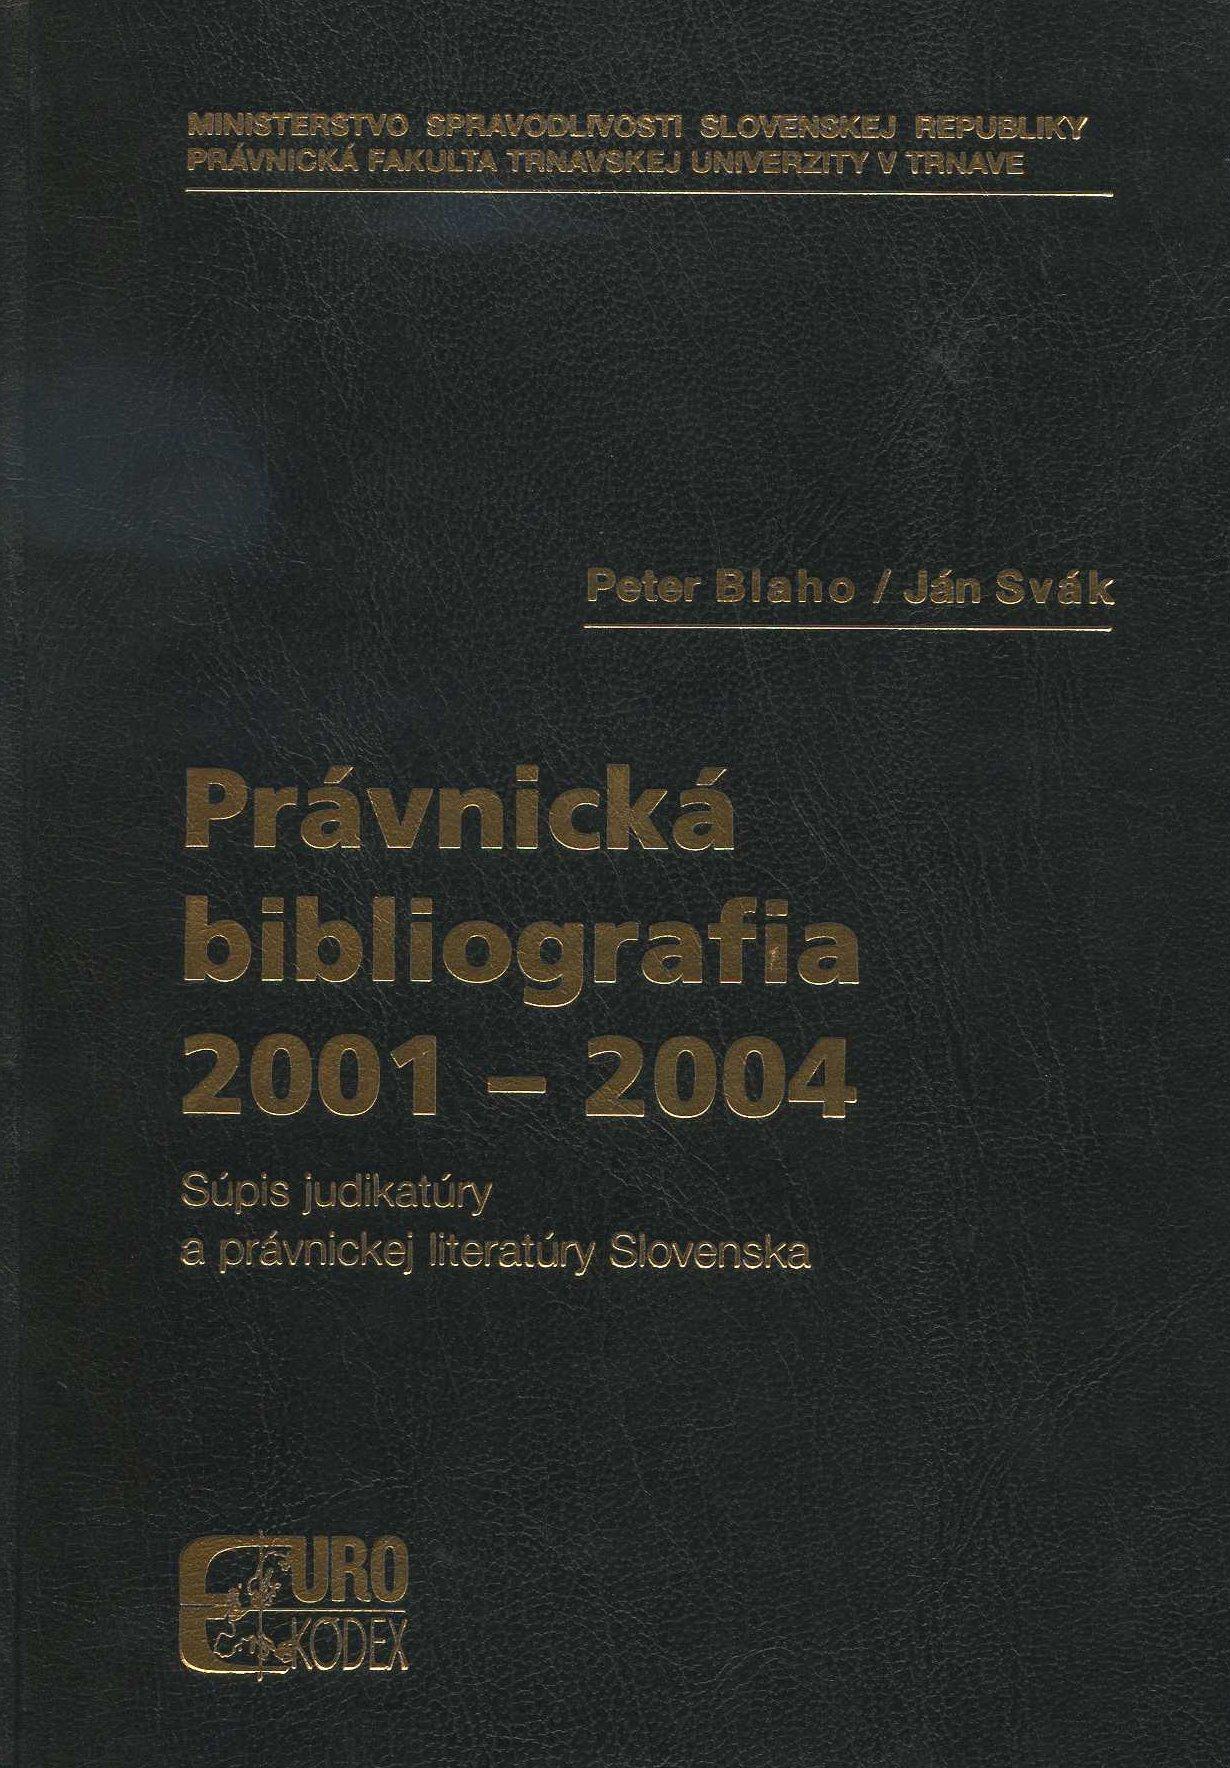 Právnická bibliografia 2001-2004